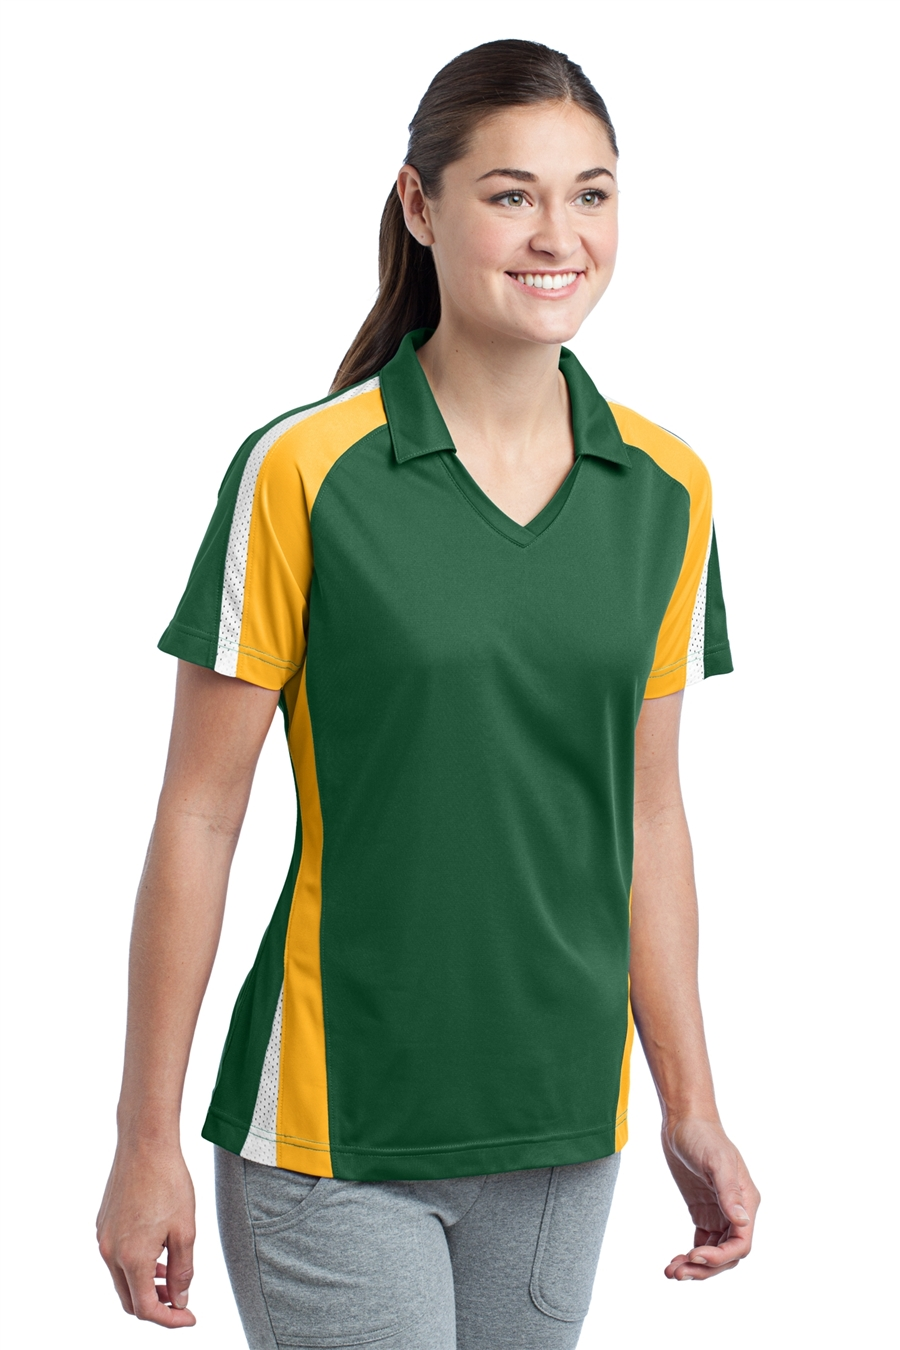 Sport-Tek LST654 Womens Tricolor Micropique Sport-Wick Polo Shirts 51e6be364a